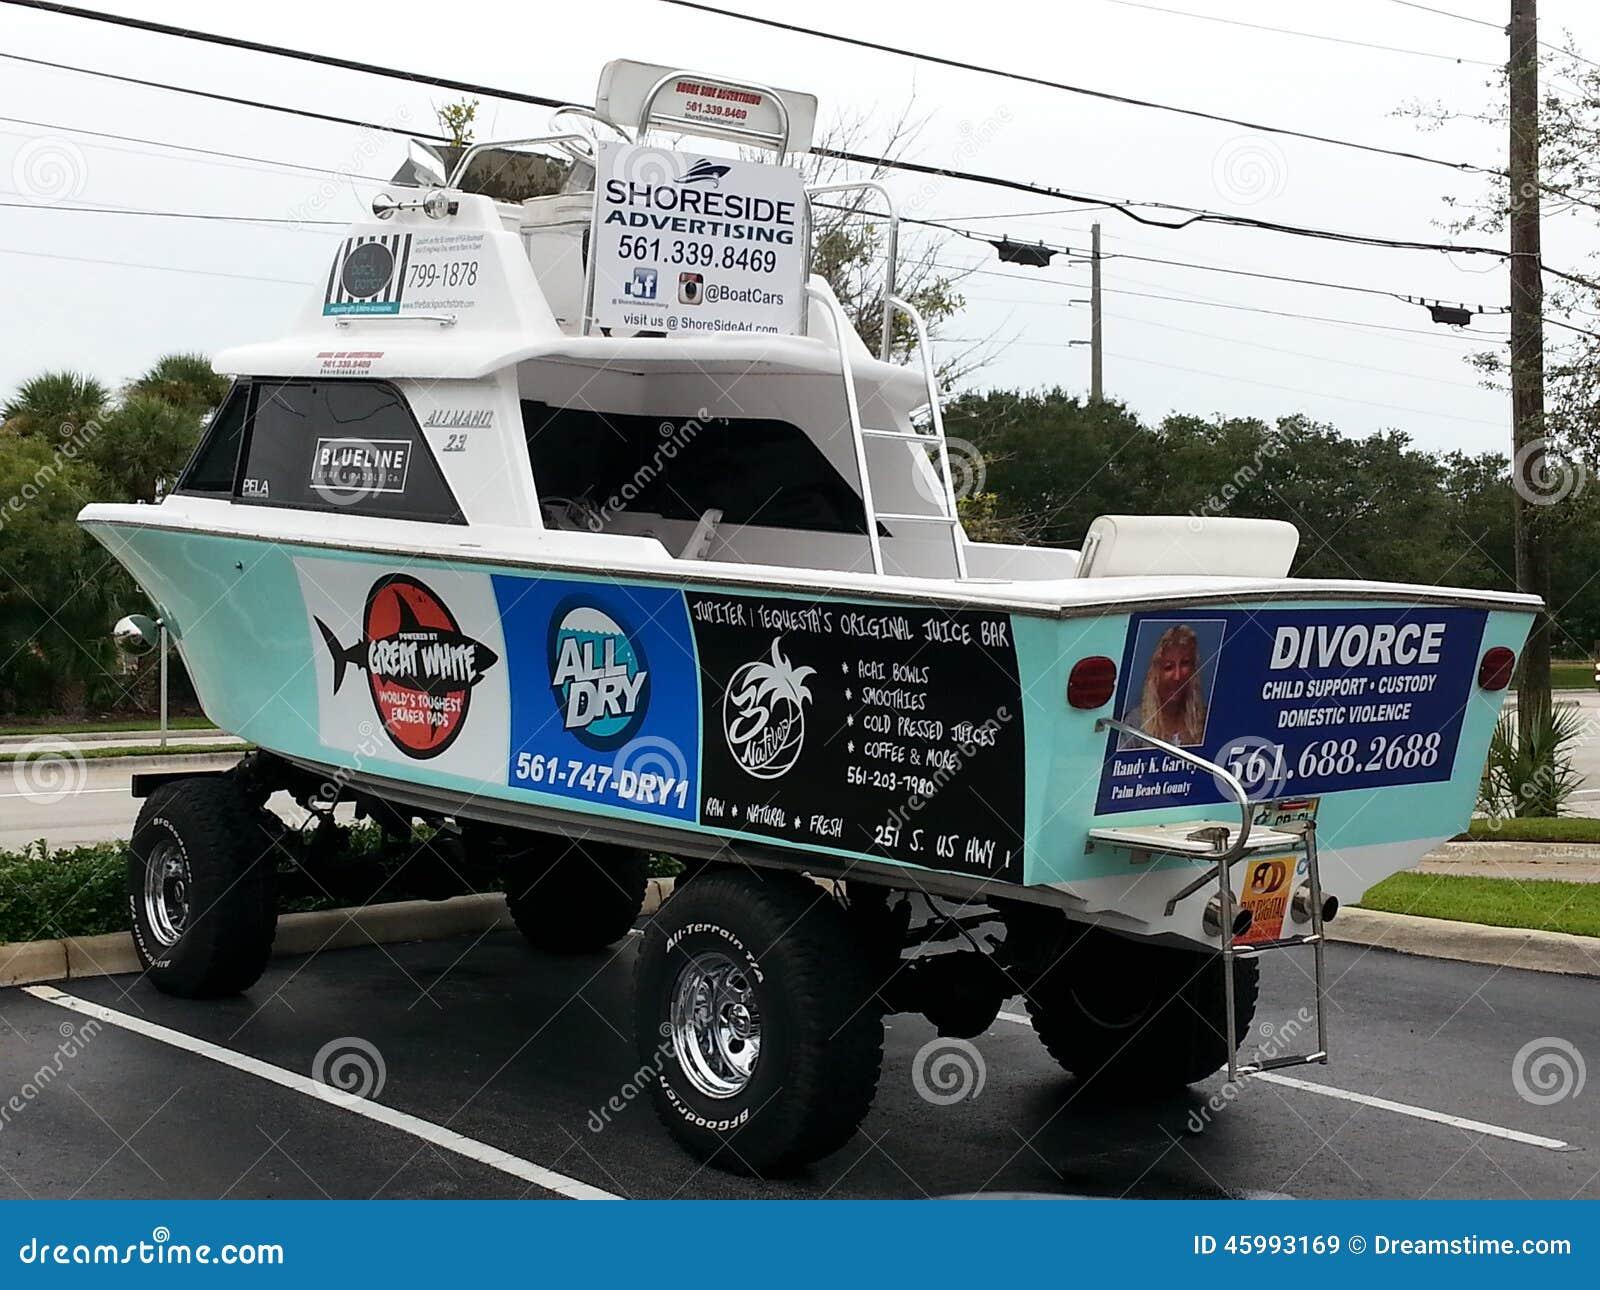 boat-truck-combo-45993169.jpg